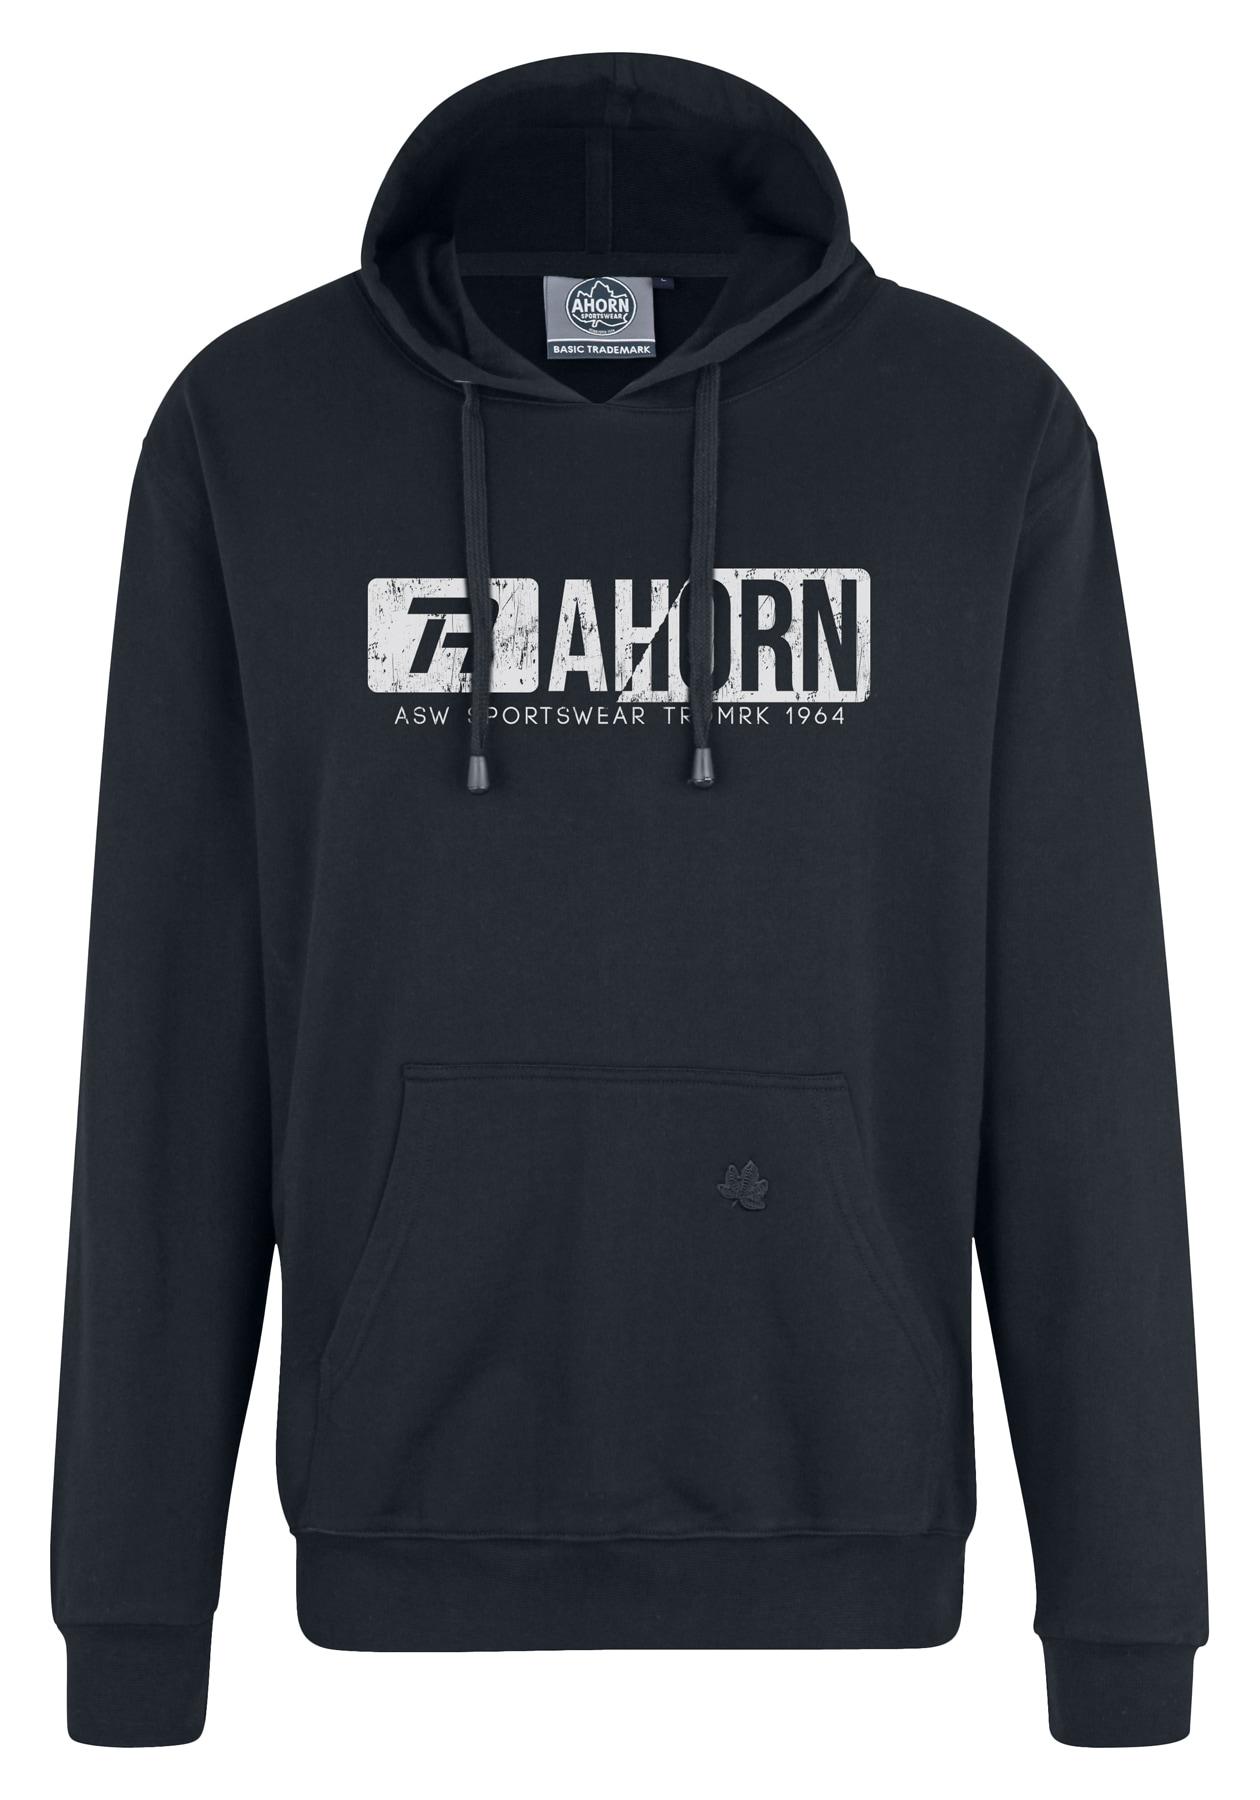 ahorn sportswear -  Kapuzenpullover, mit trendigem Frontprint